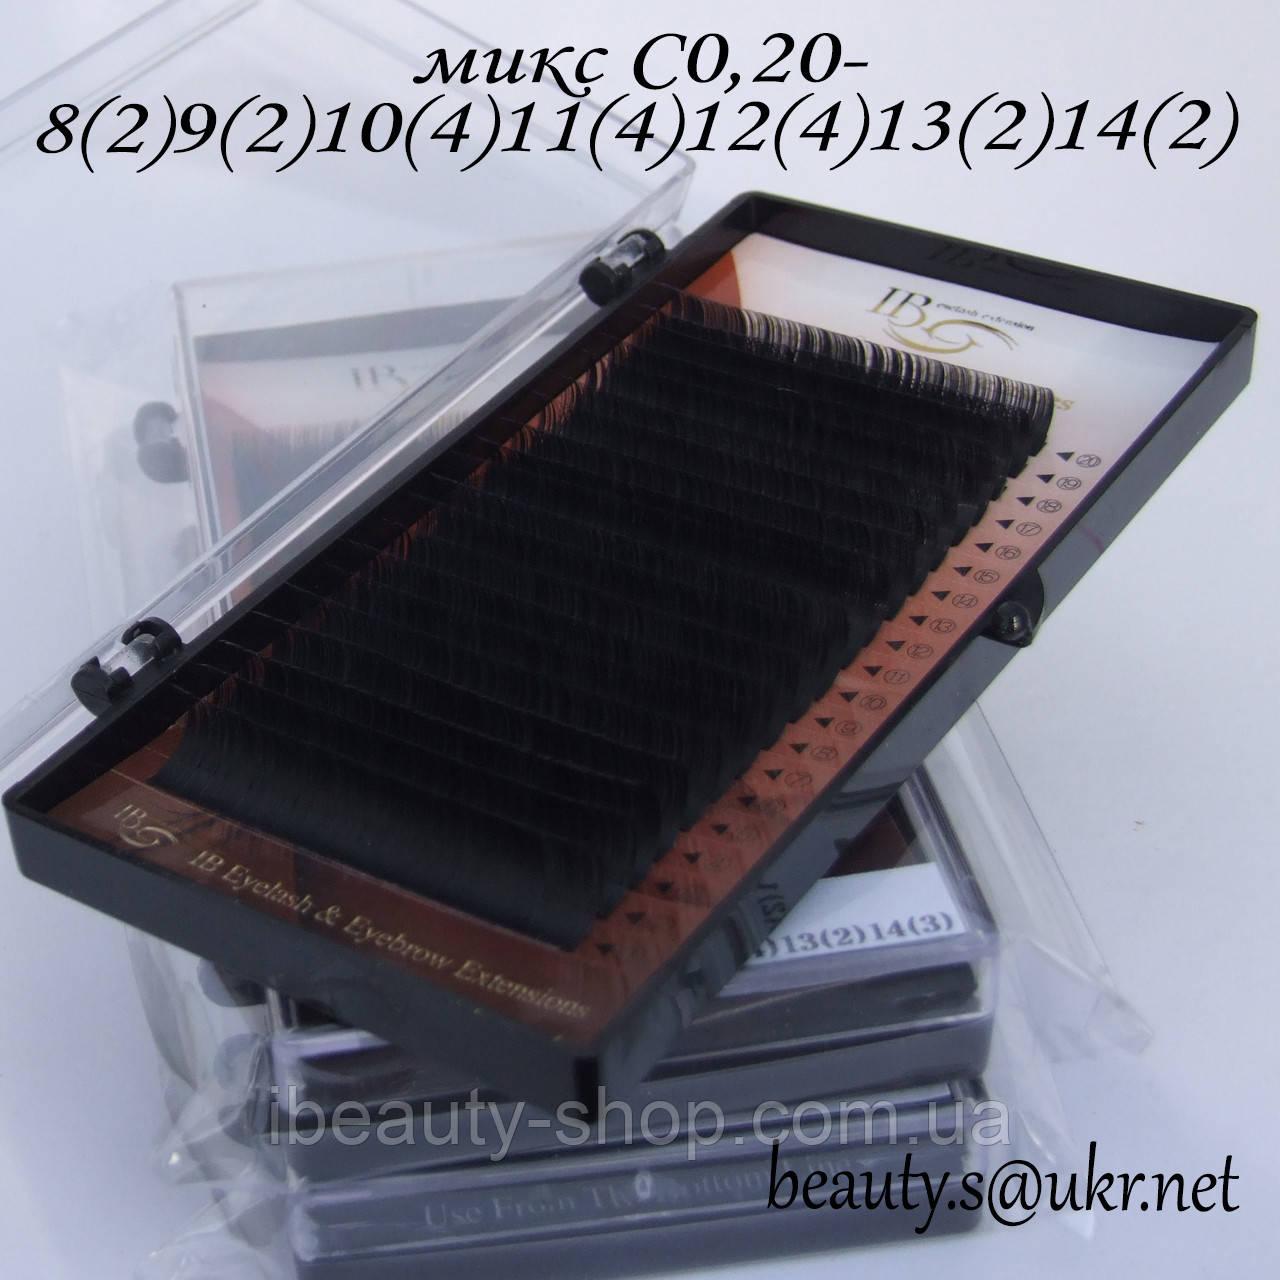 Ресницы I-Beauty микс С-0,20 8-14мм